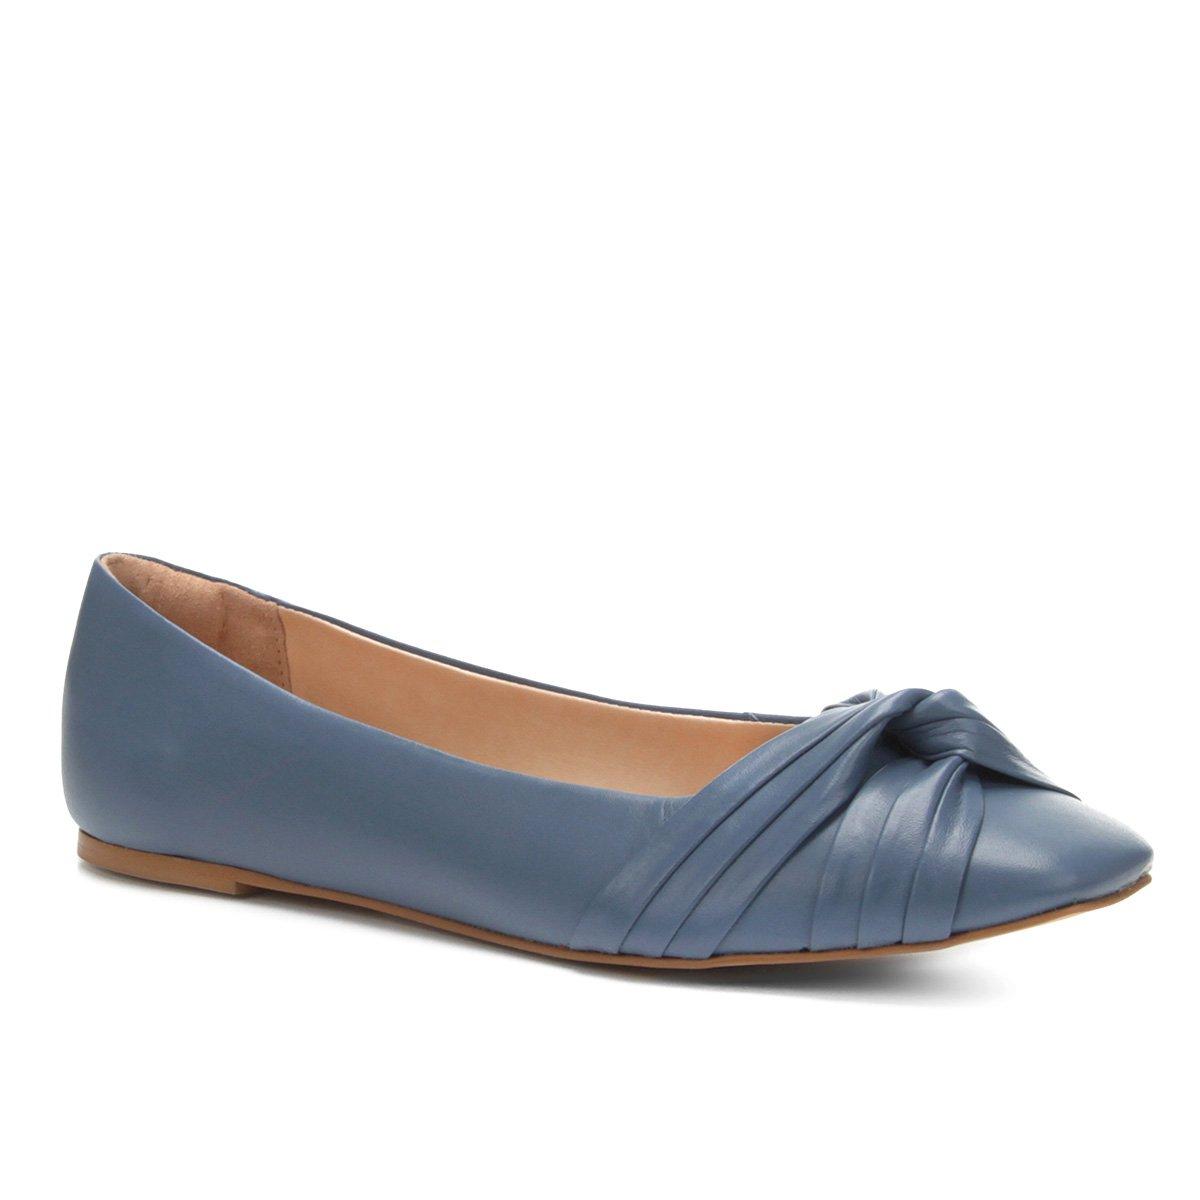 Couro Couro Azul Drapeada Drapeada Sapatilha Couro Shoestock Feminina Feminina Azul Shoestock Drapeada Shoestock Sapatilha Sapatilha xxn4qfA